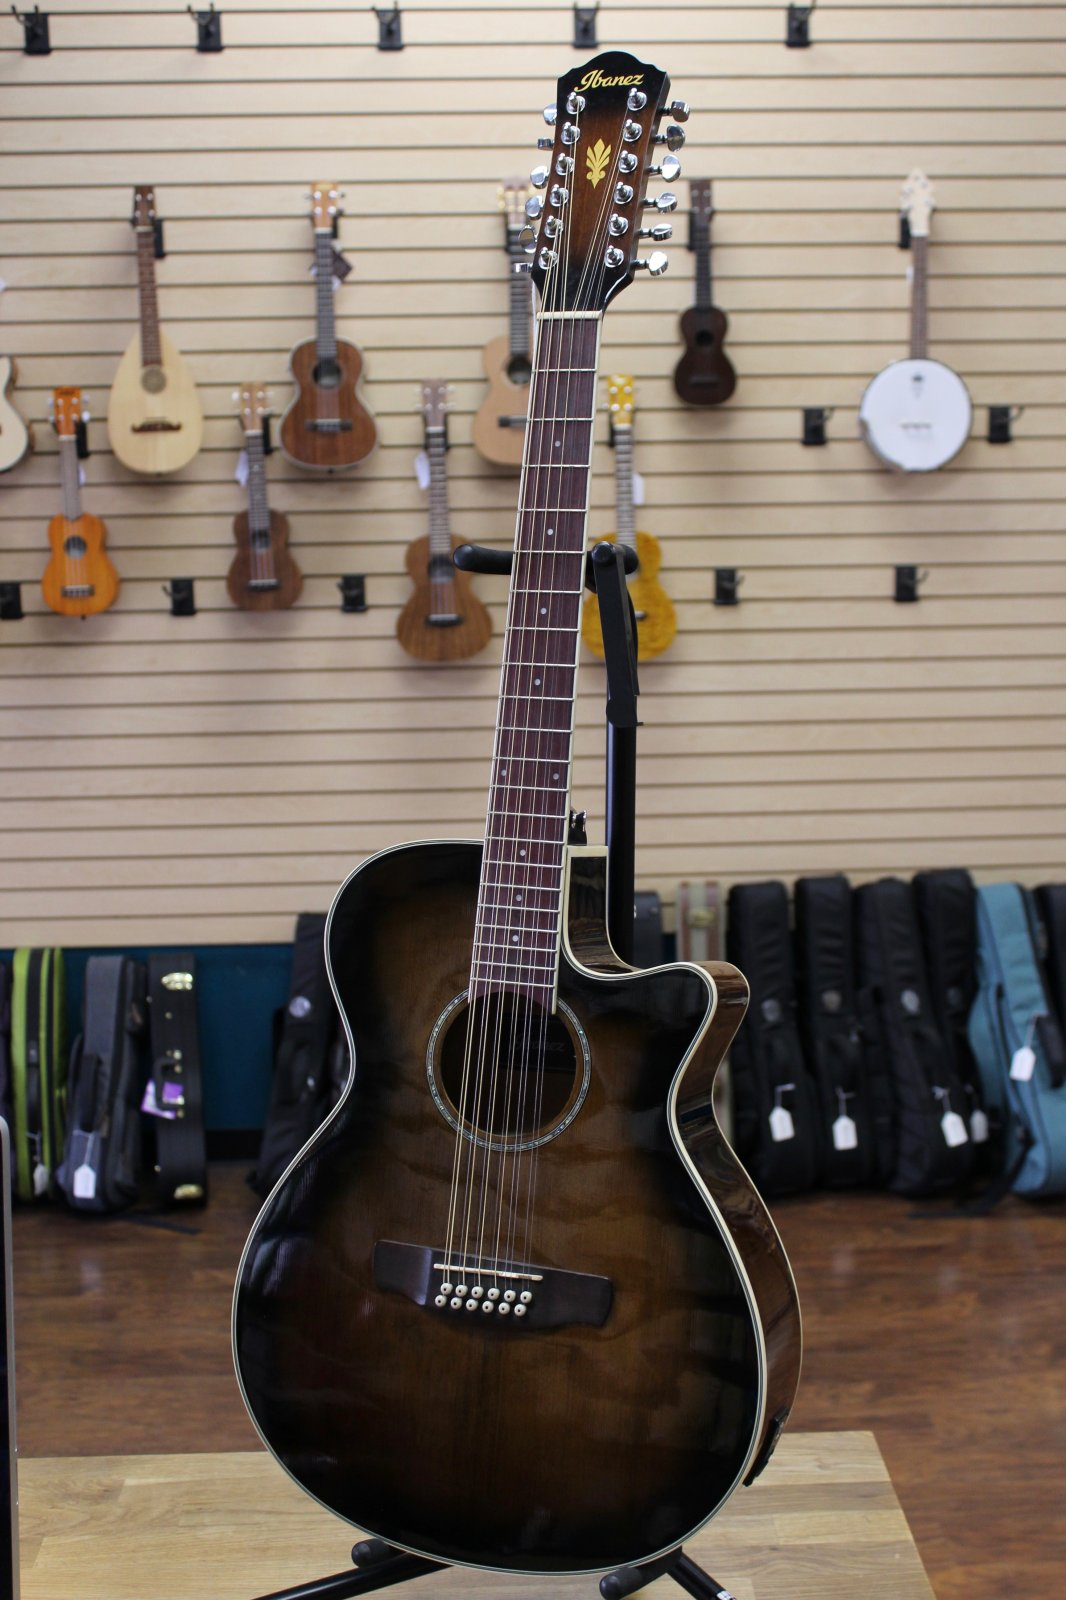 Preowned Ibanez AEG1812II-DVS 12-String Guitar